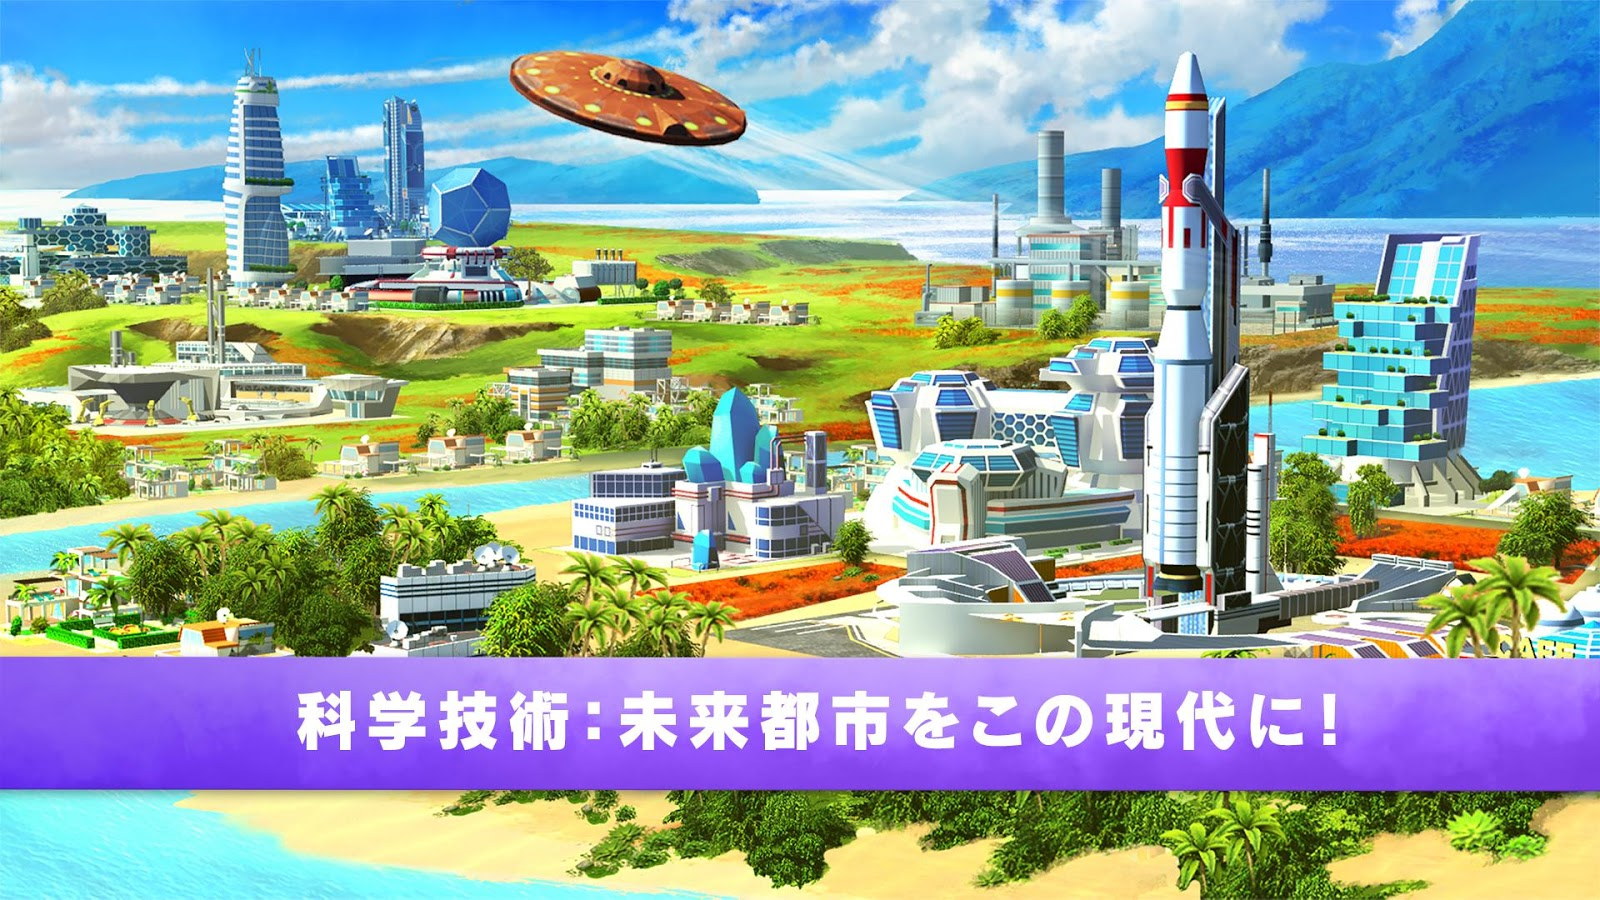 androidアプリ Little Big City 2攻略スクリーンショット7